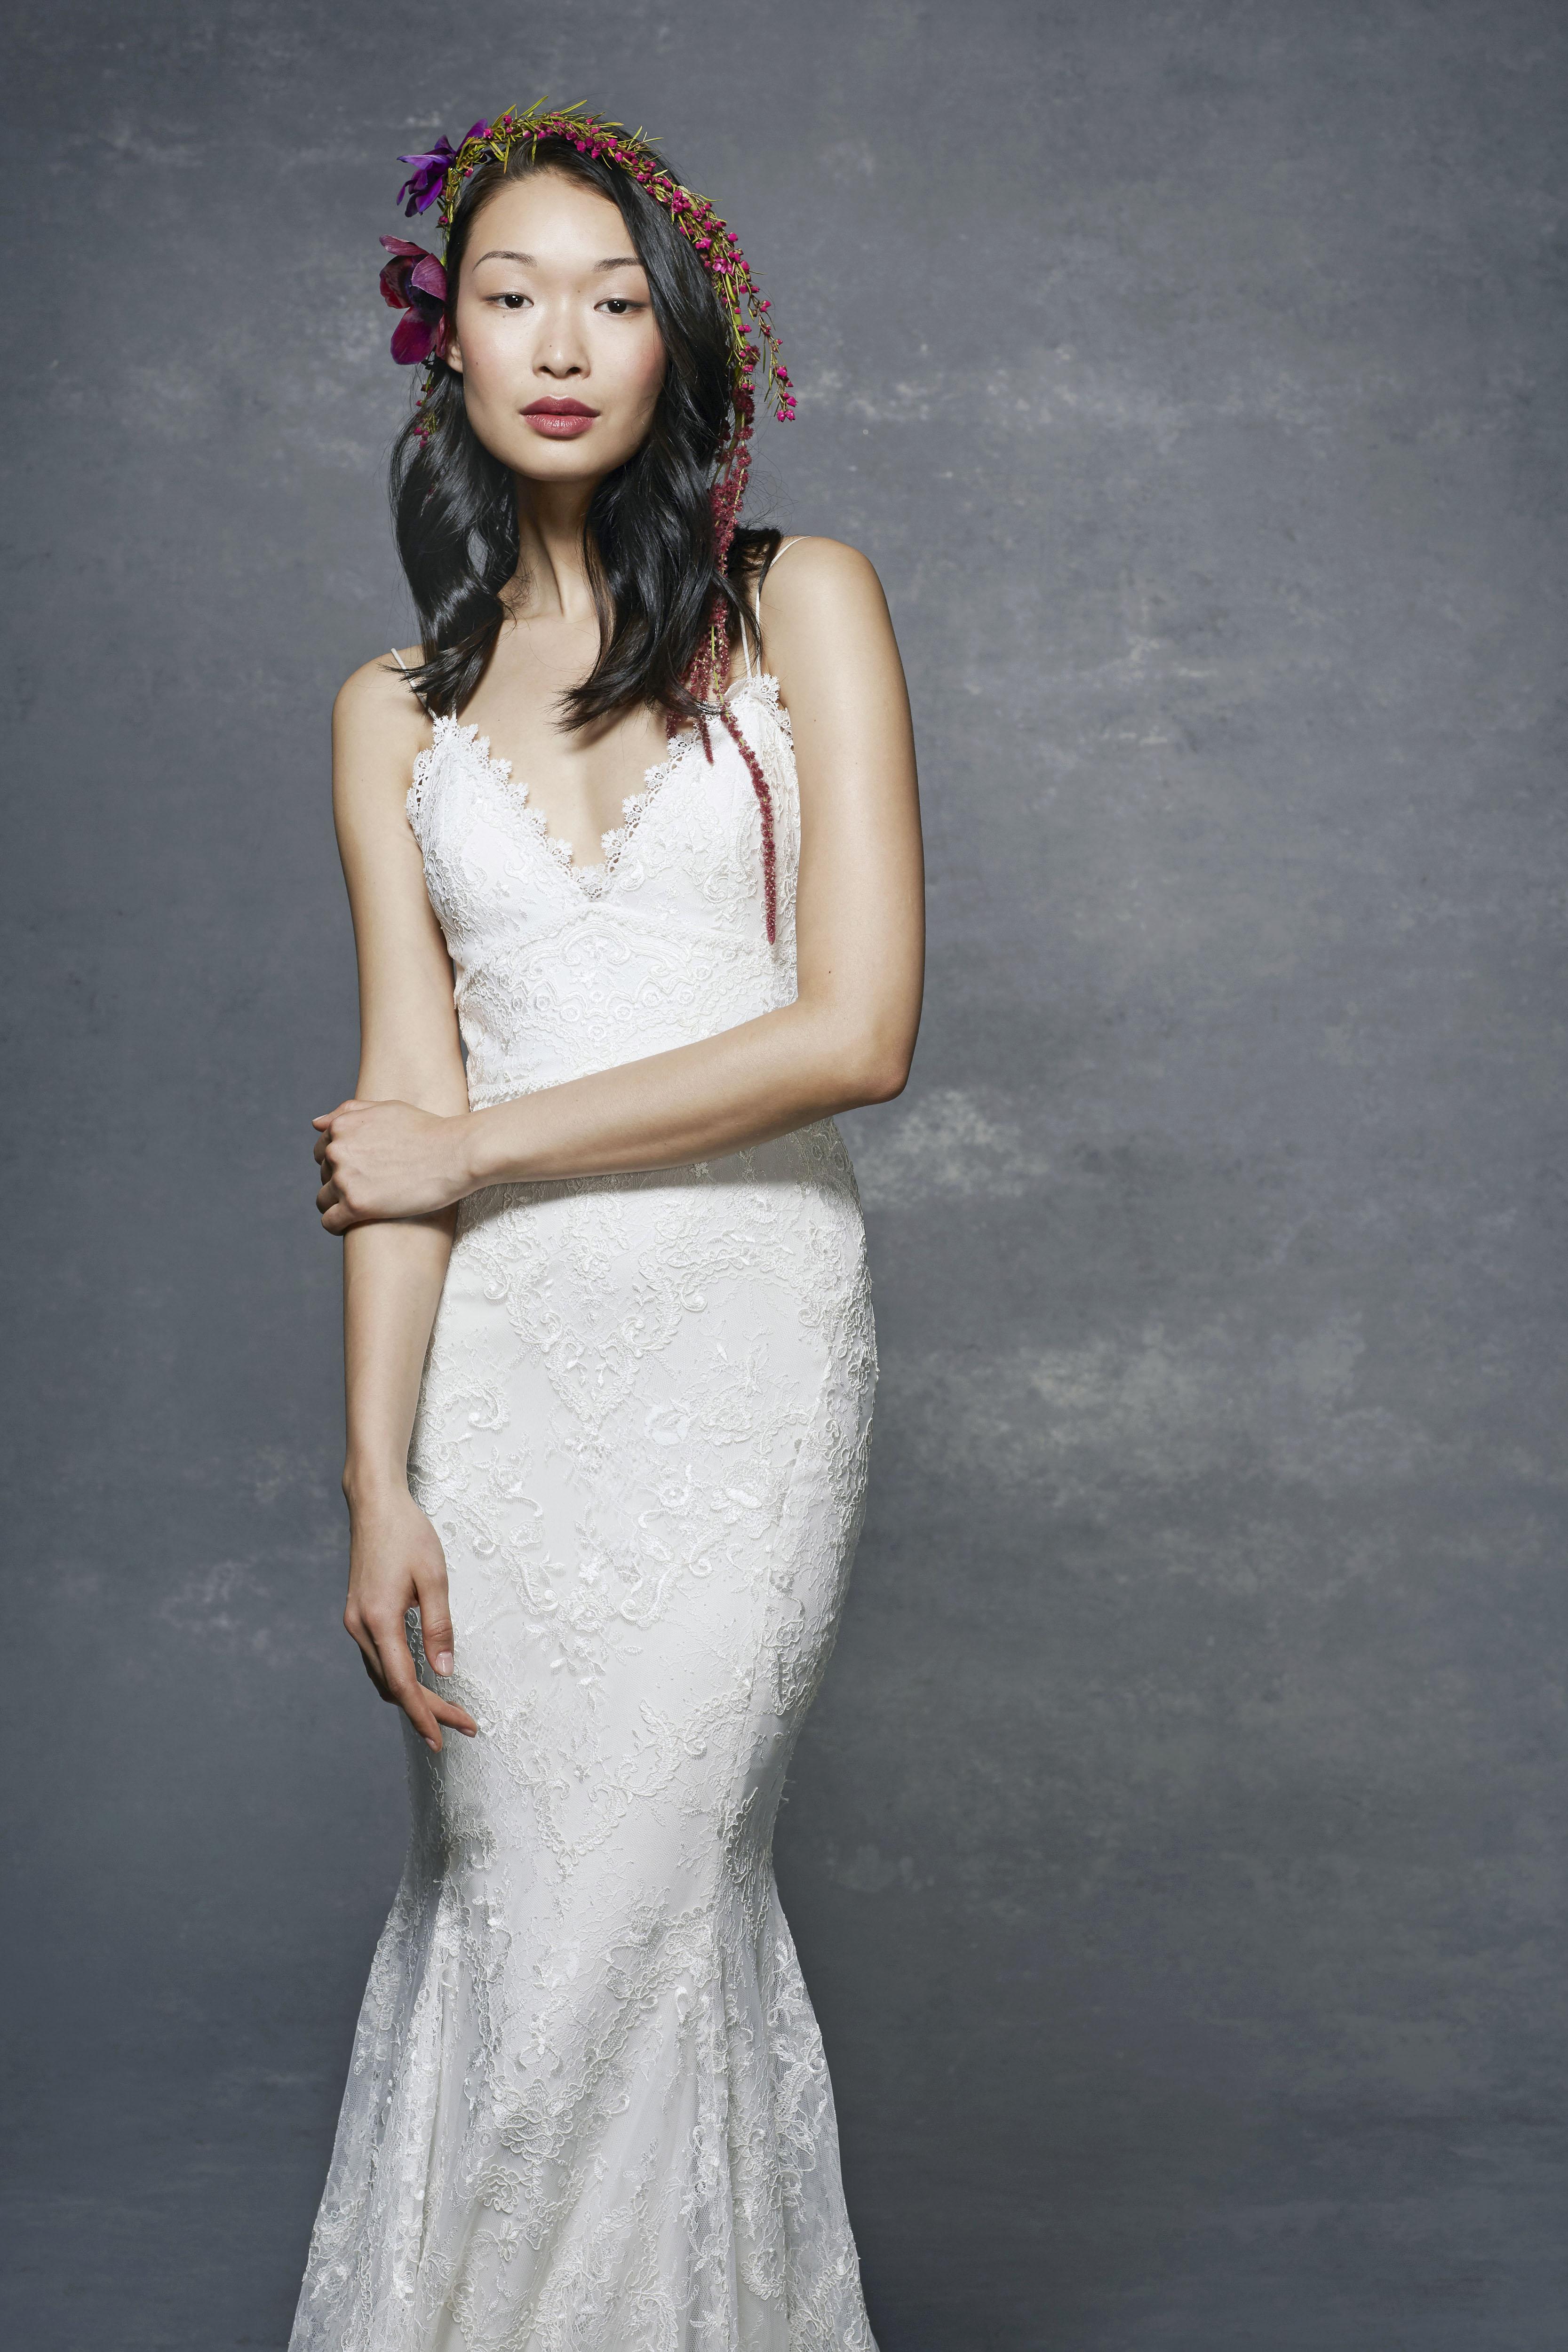 marchesa notte bridal wedding dress spaghetti strap v-neck